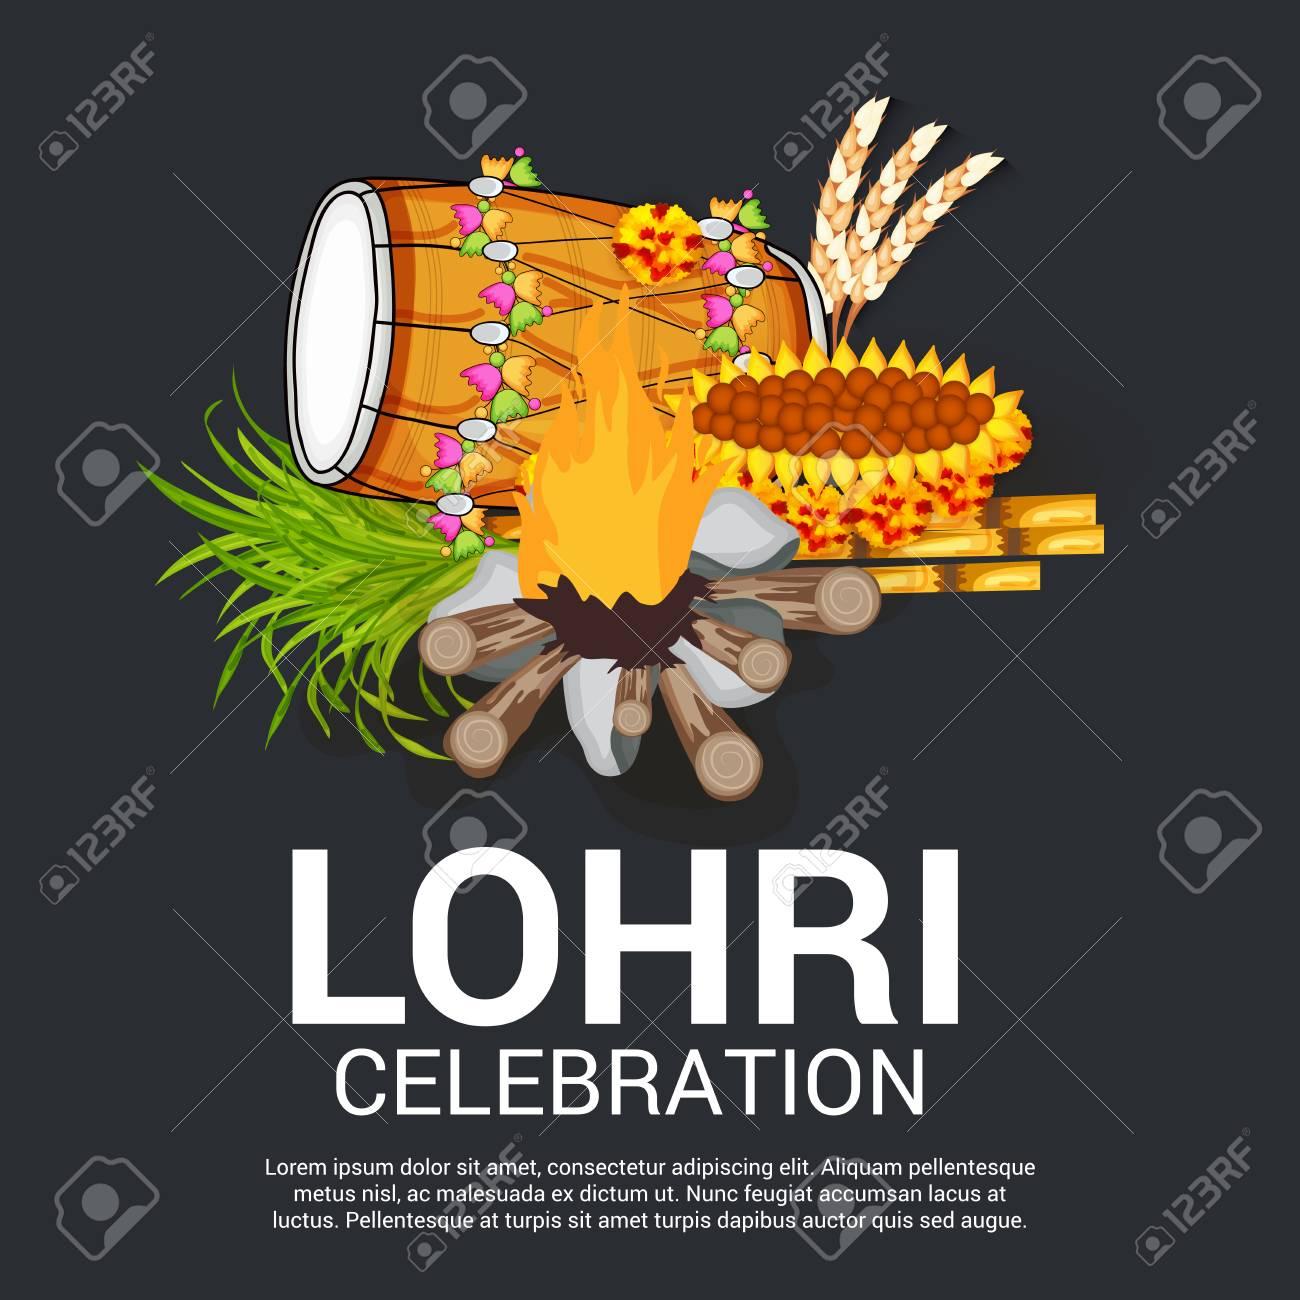 Happy lohri greeting card design royalty free cliparts vectors happy lohri greeting card design stock vector 92525512 m4hsunfo